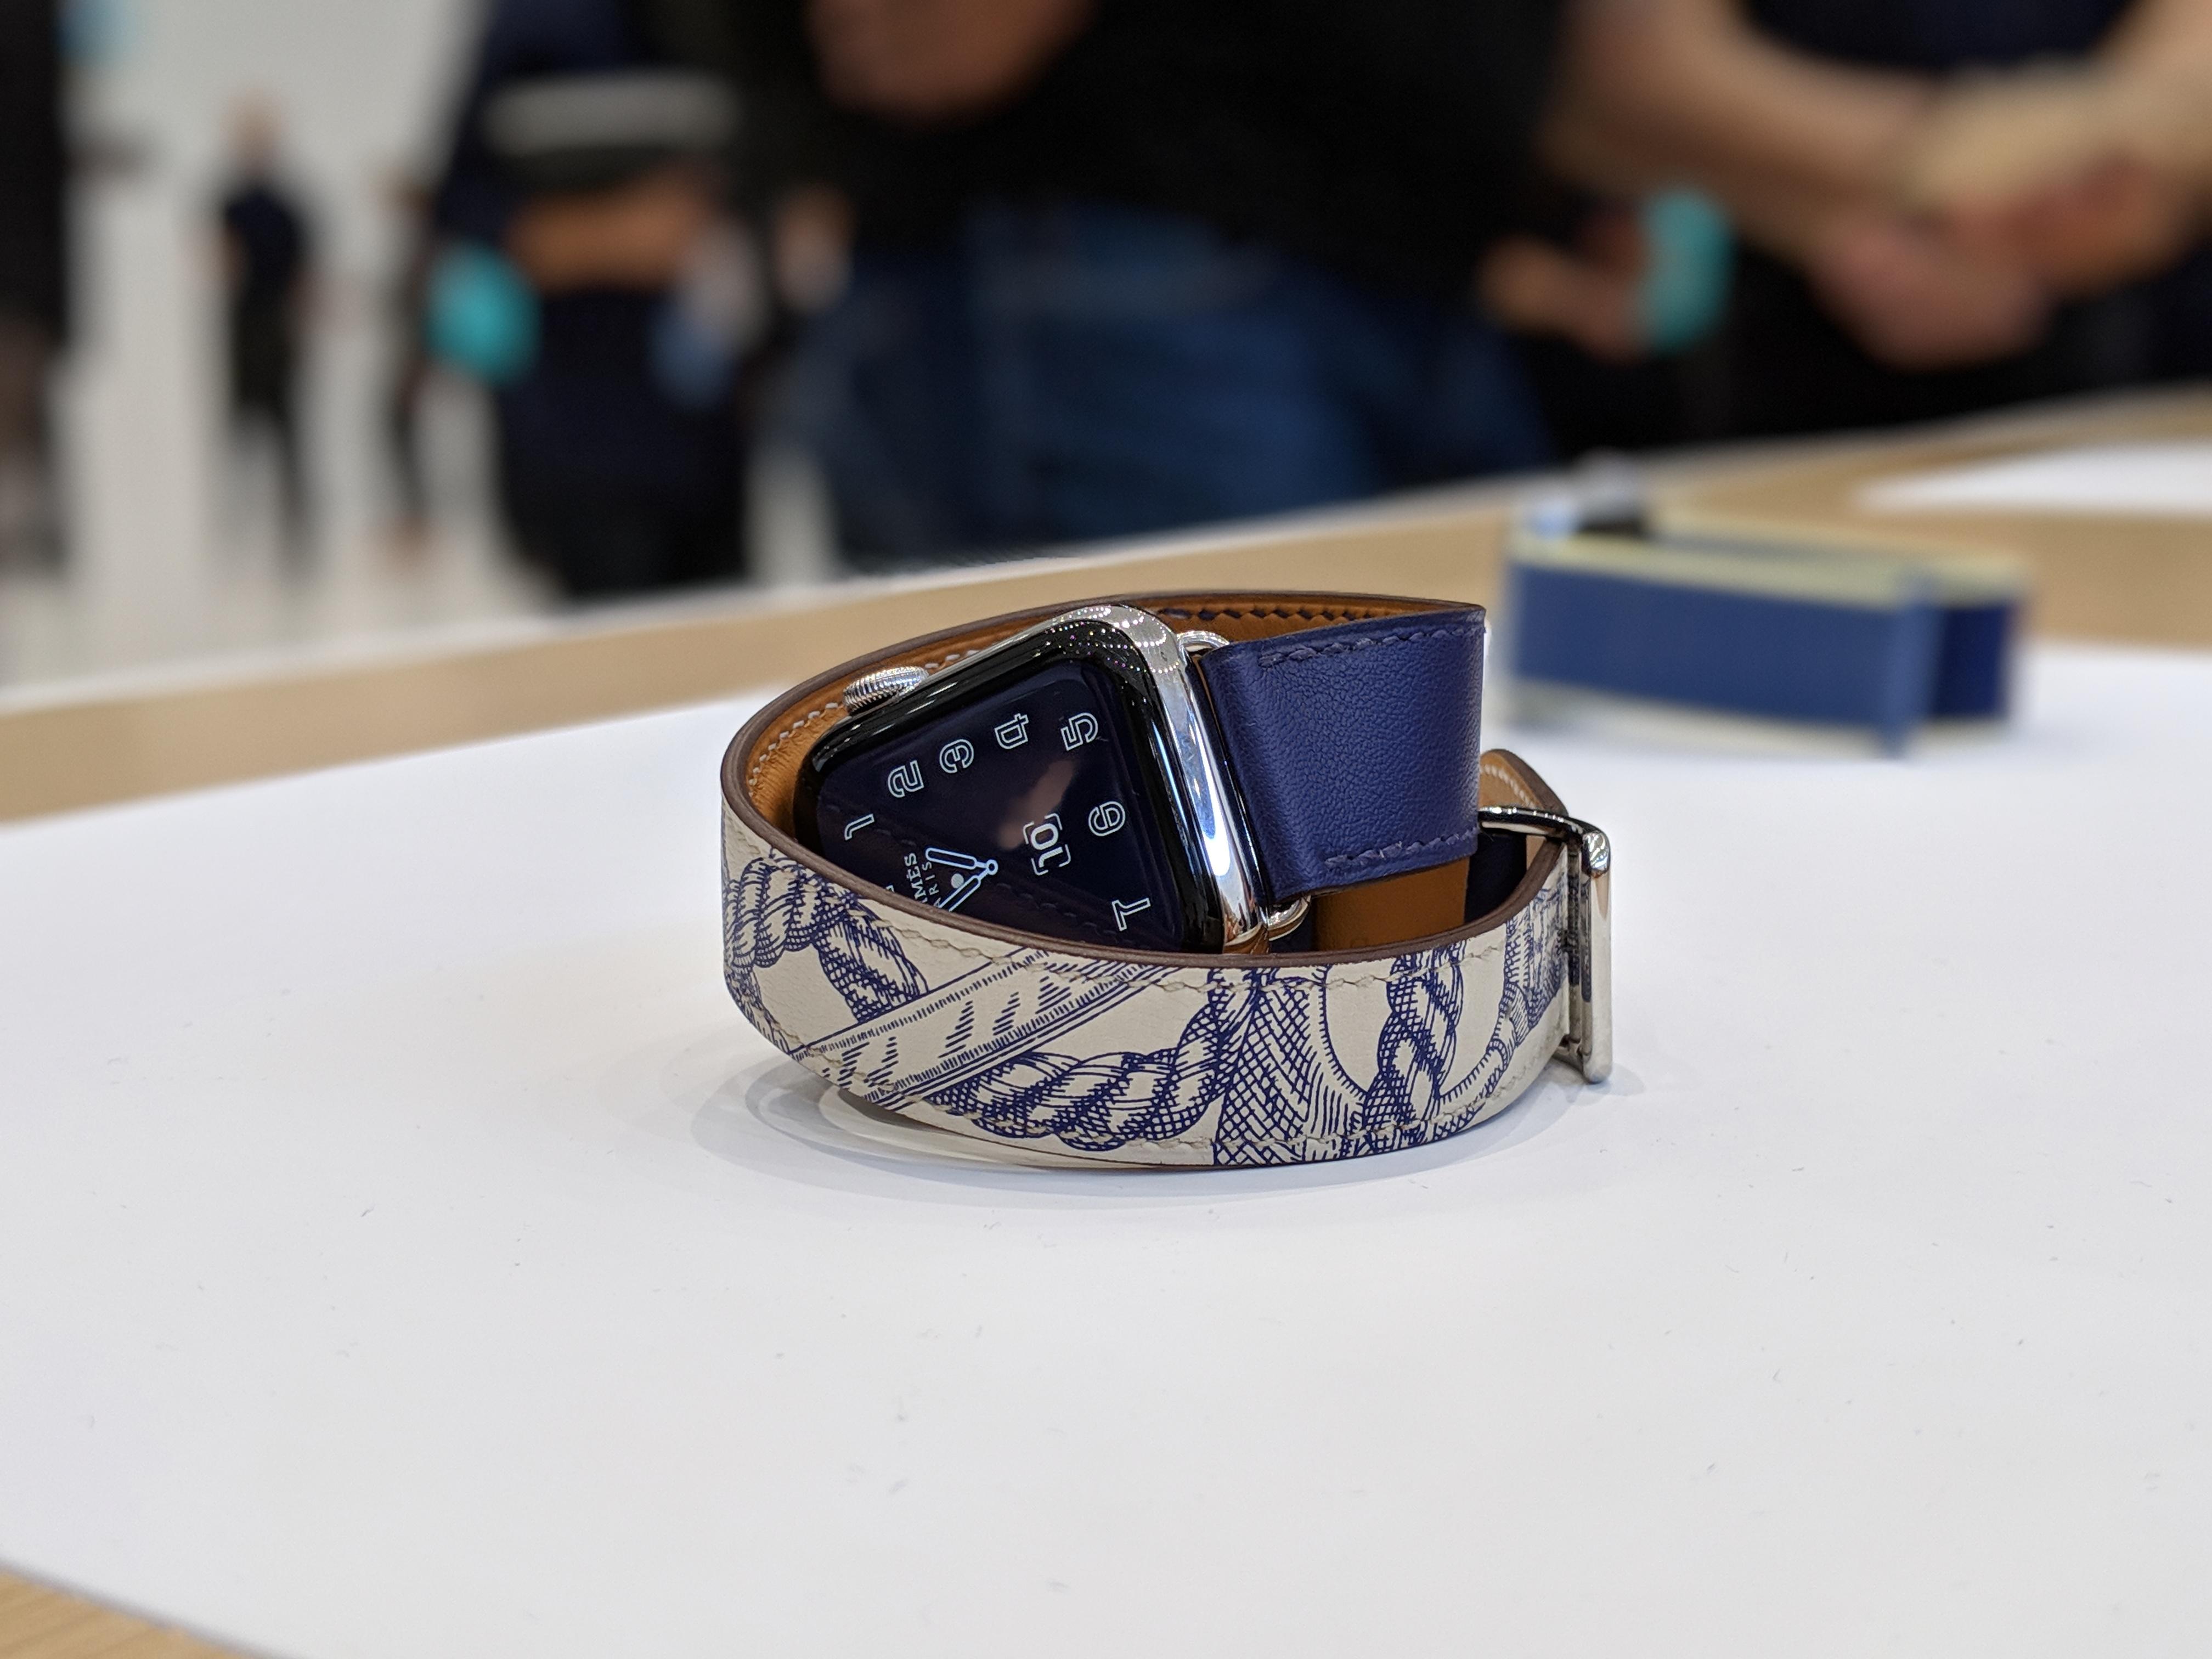 The latest version of Hermès' Apple Watch Series 5.